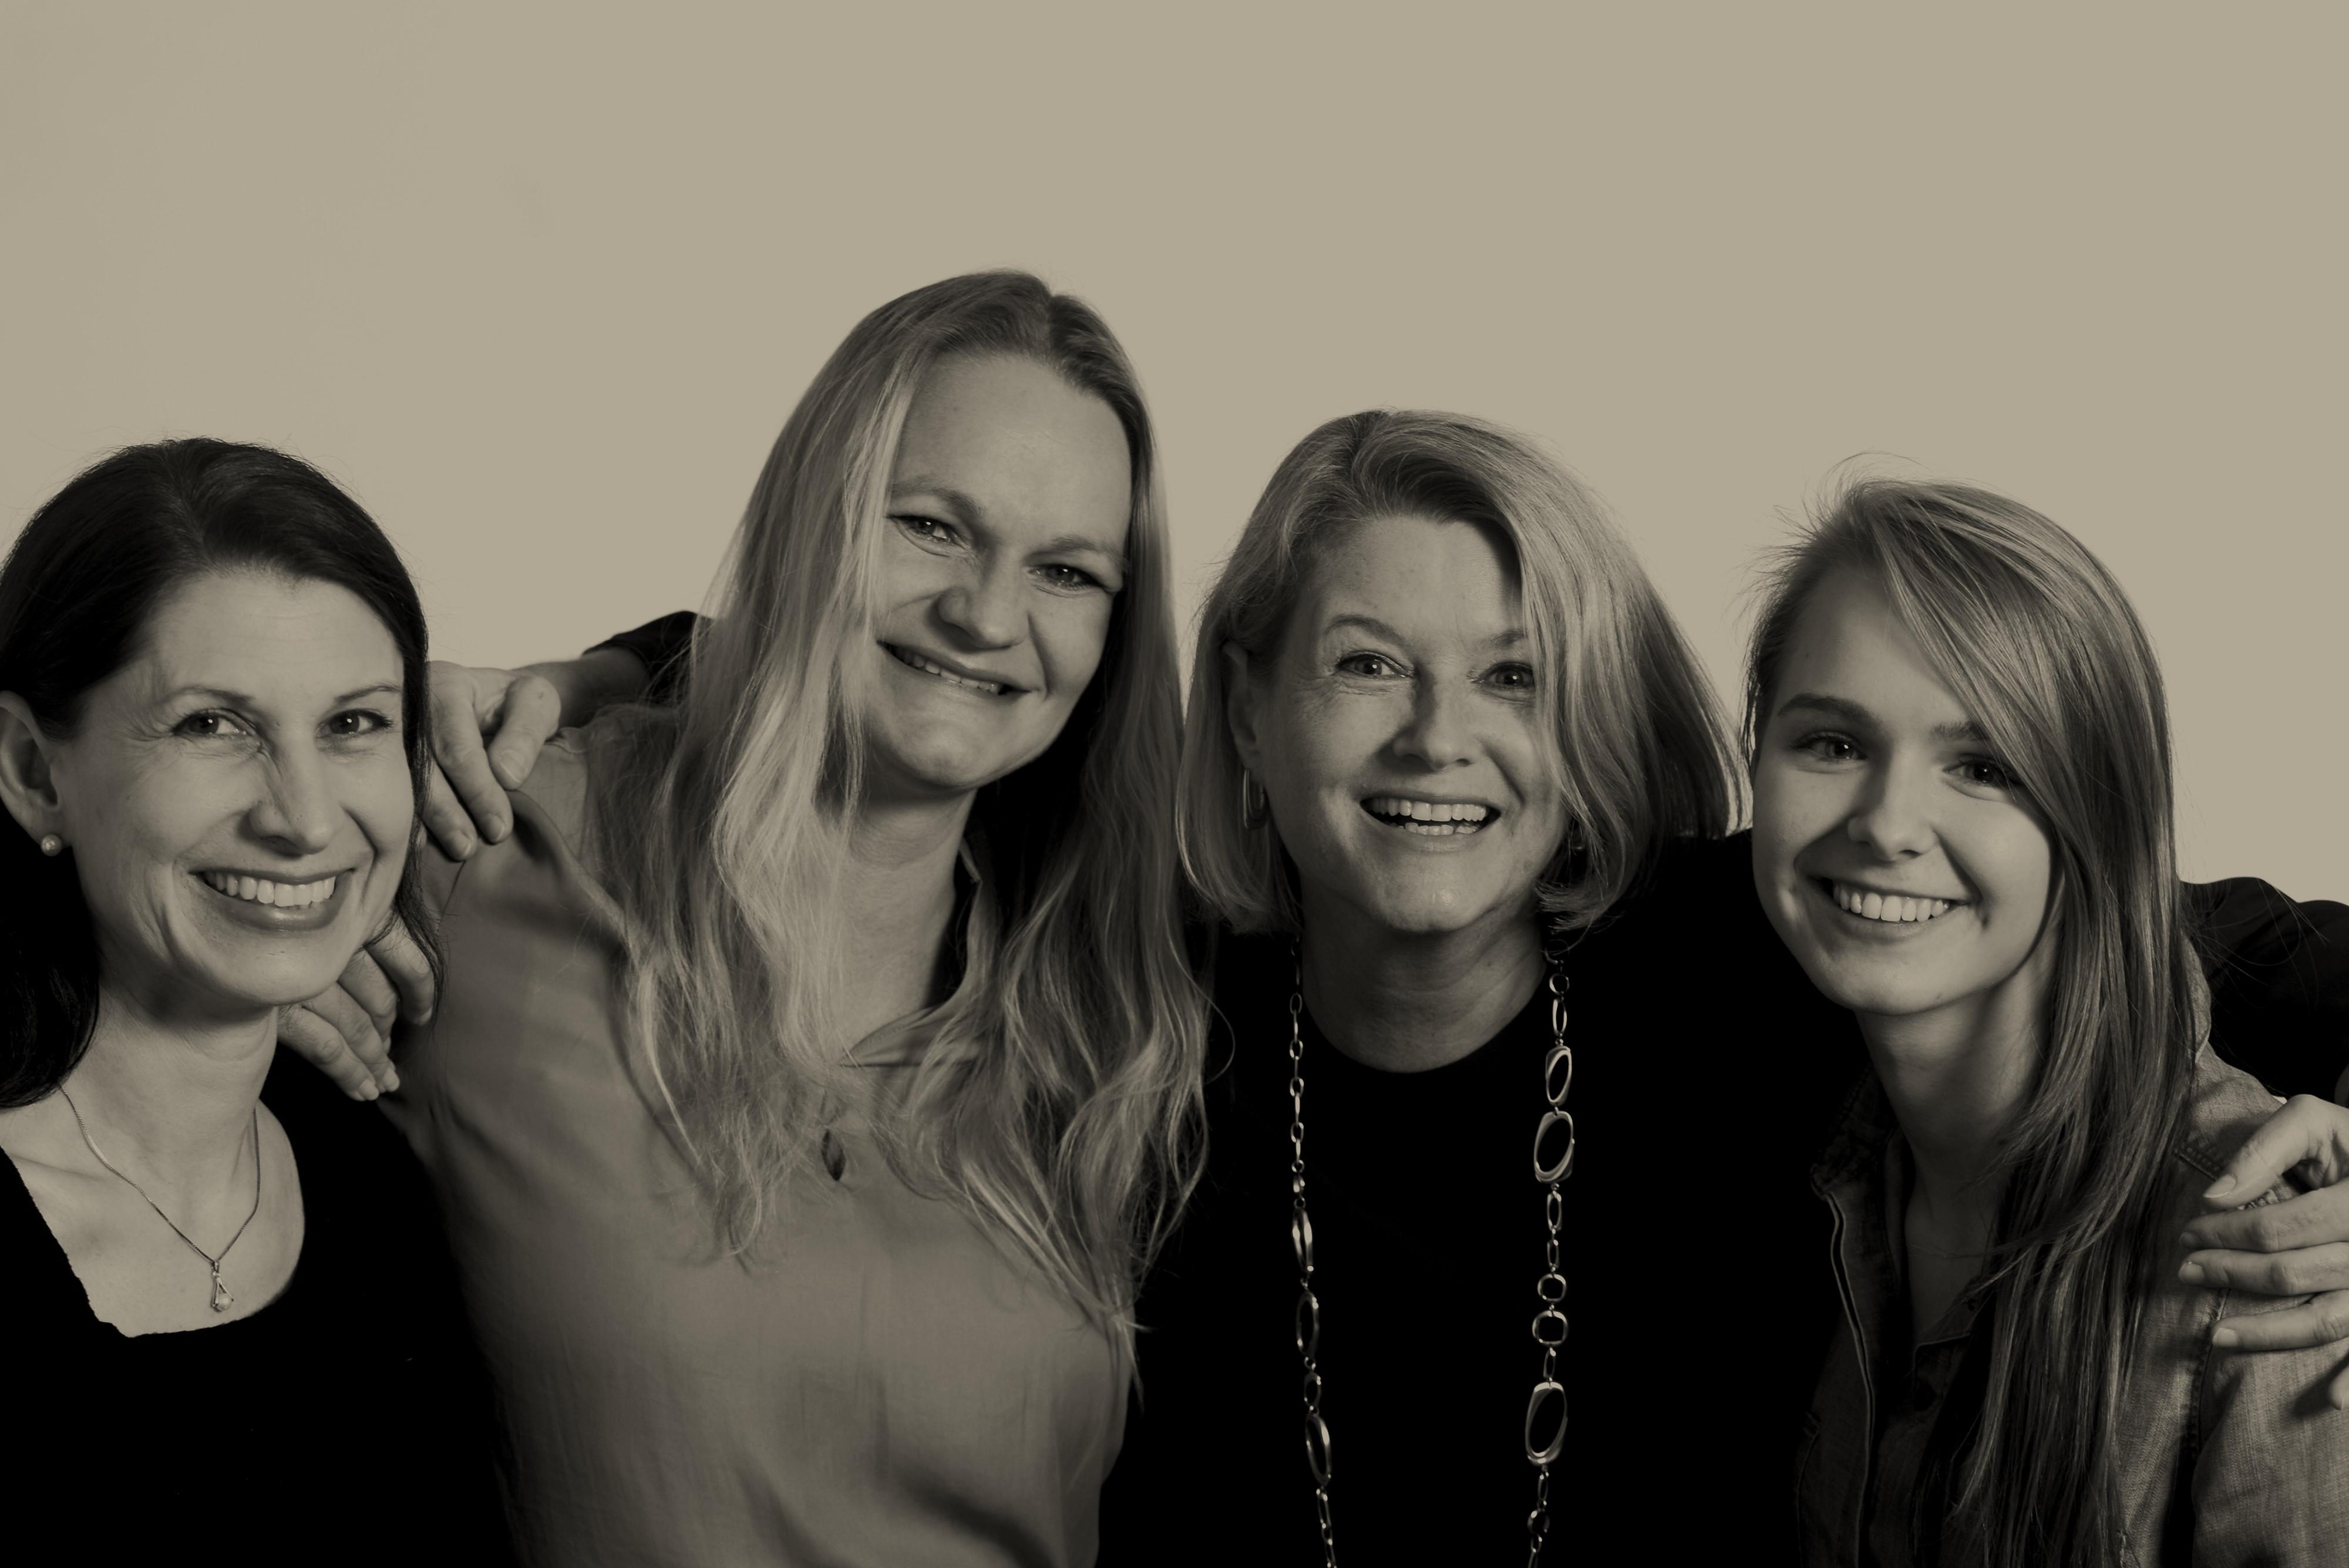 Team, Konzept Team, Werbeagentur, Mirjam Haberlandt, Michaela Özdemir, Angelika Höflinger, Anja Höhn